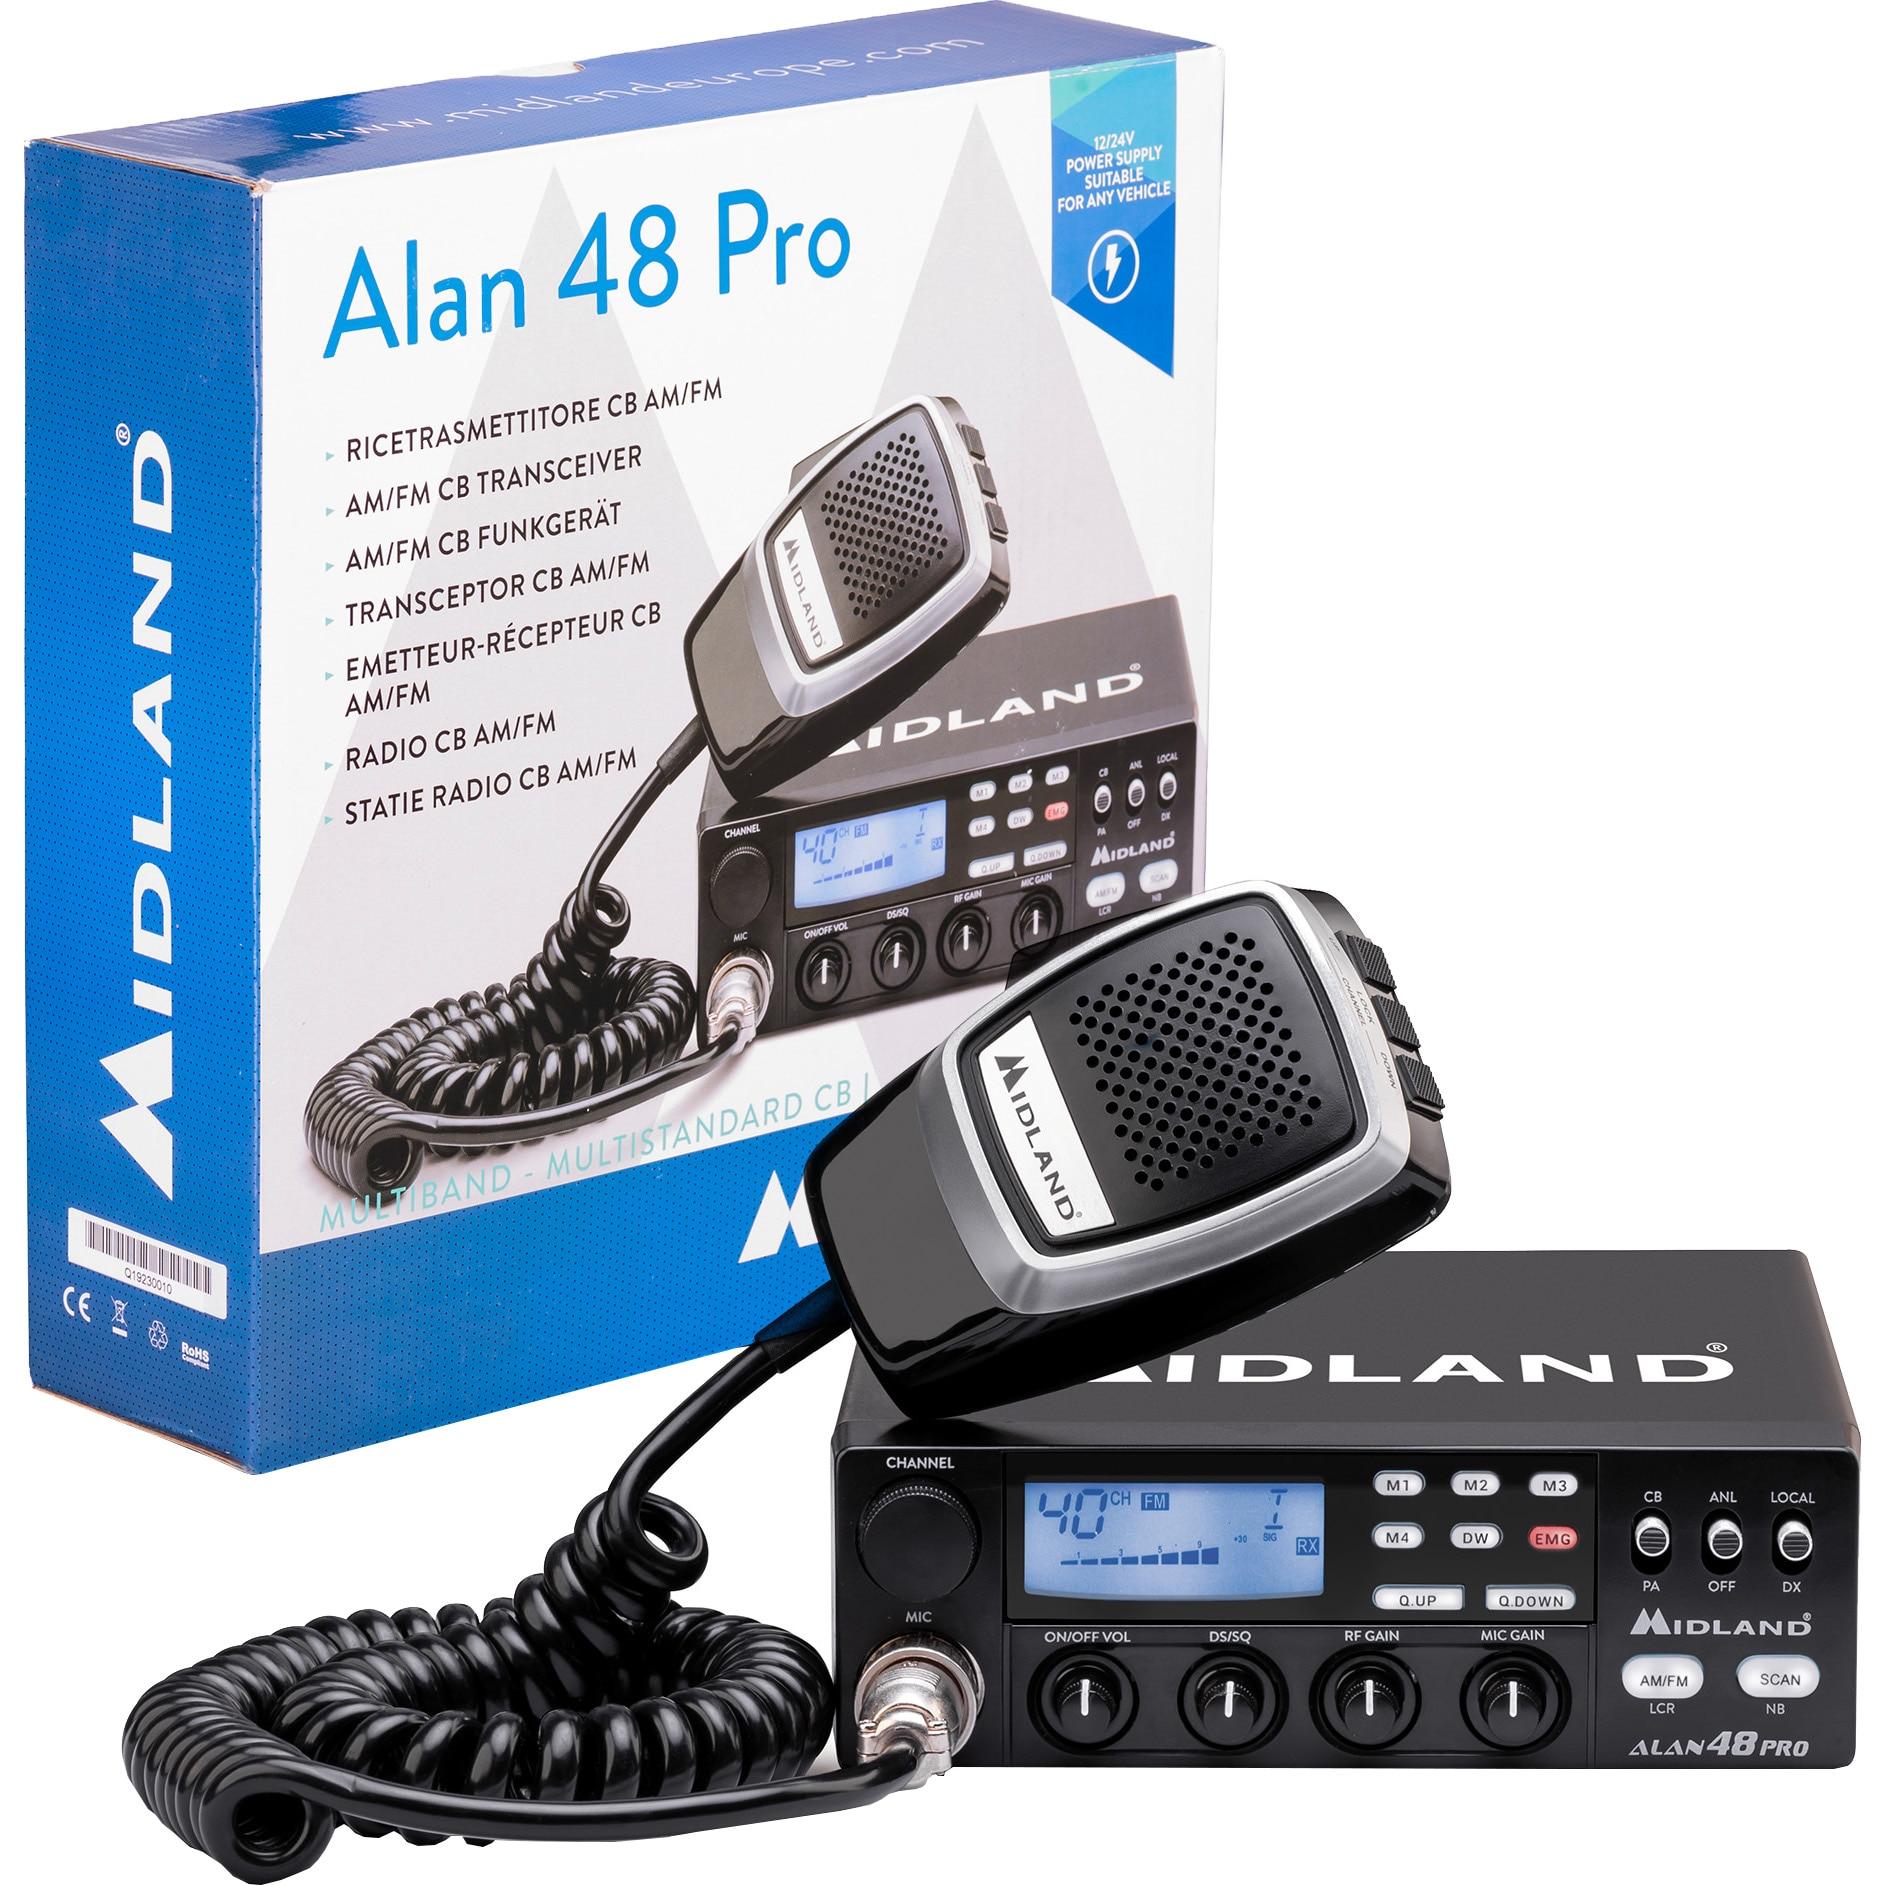 Fotografie Statie radio CB Midland Alan 48 Pro cu ASQ Digital, AM/FM, Noise Blanker, 12-24V